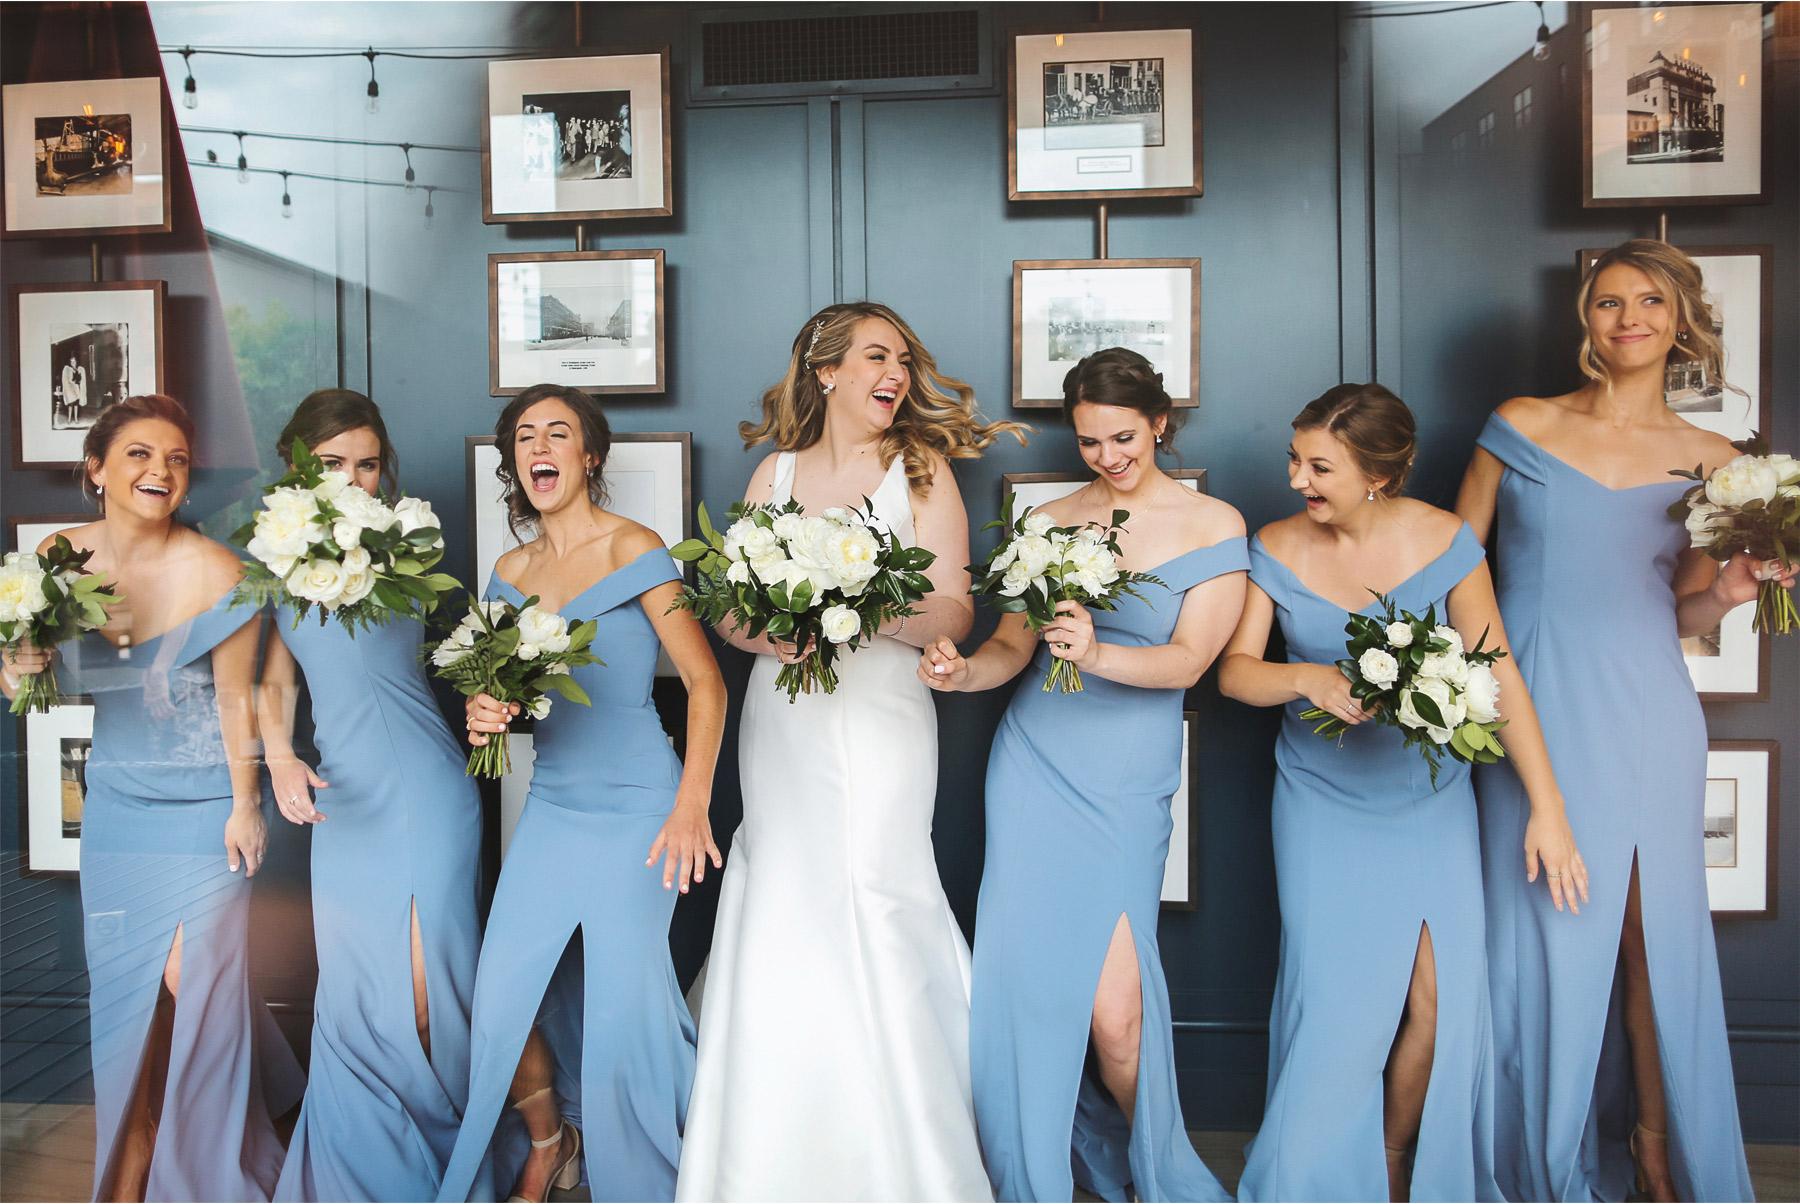 08-Minneapolis-Minnesota-Wedding-Vick-Photography-The-Depot-Bridesmaids-Dancing-Amelia-and-Alexander.jpg